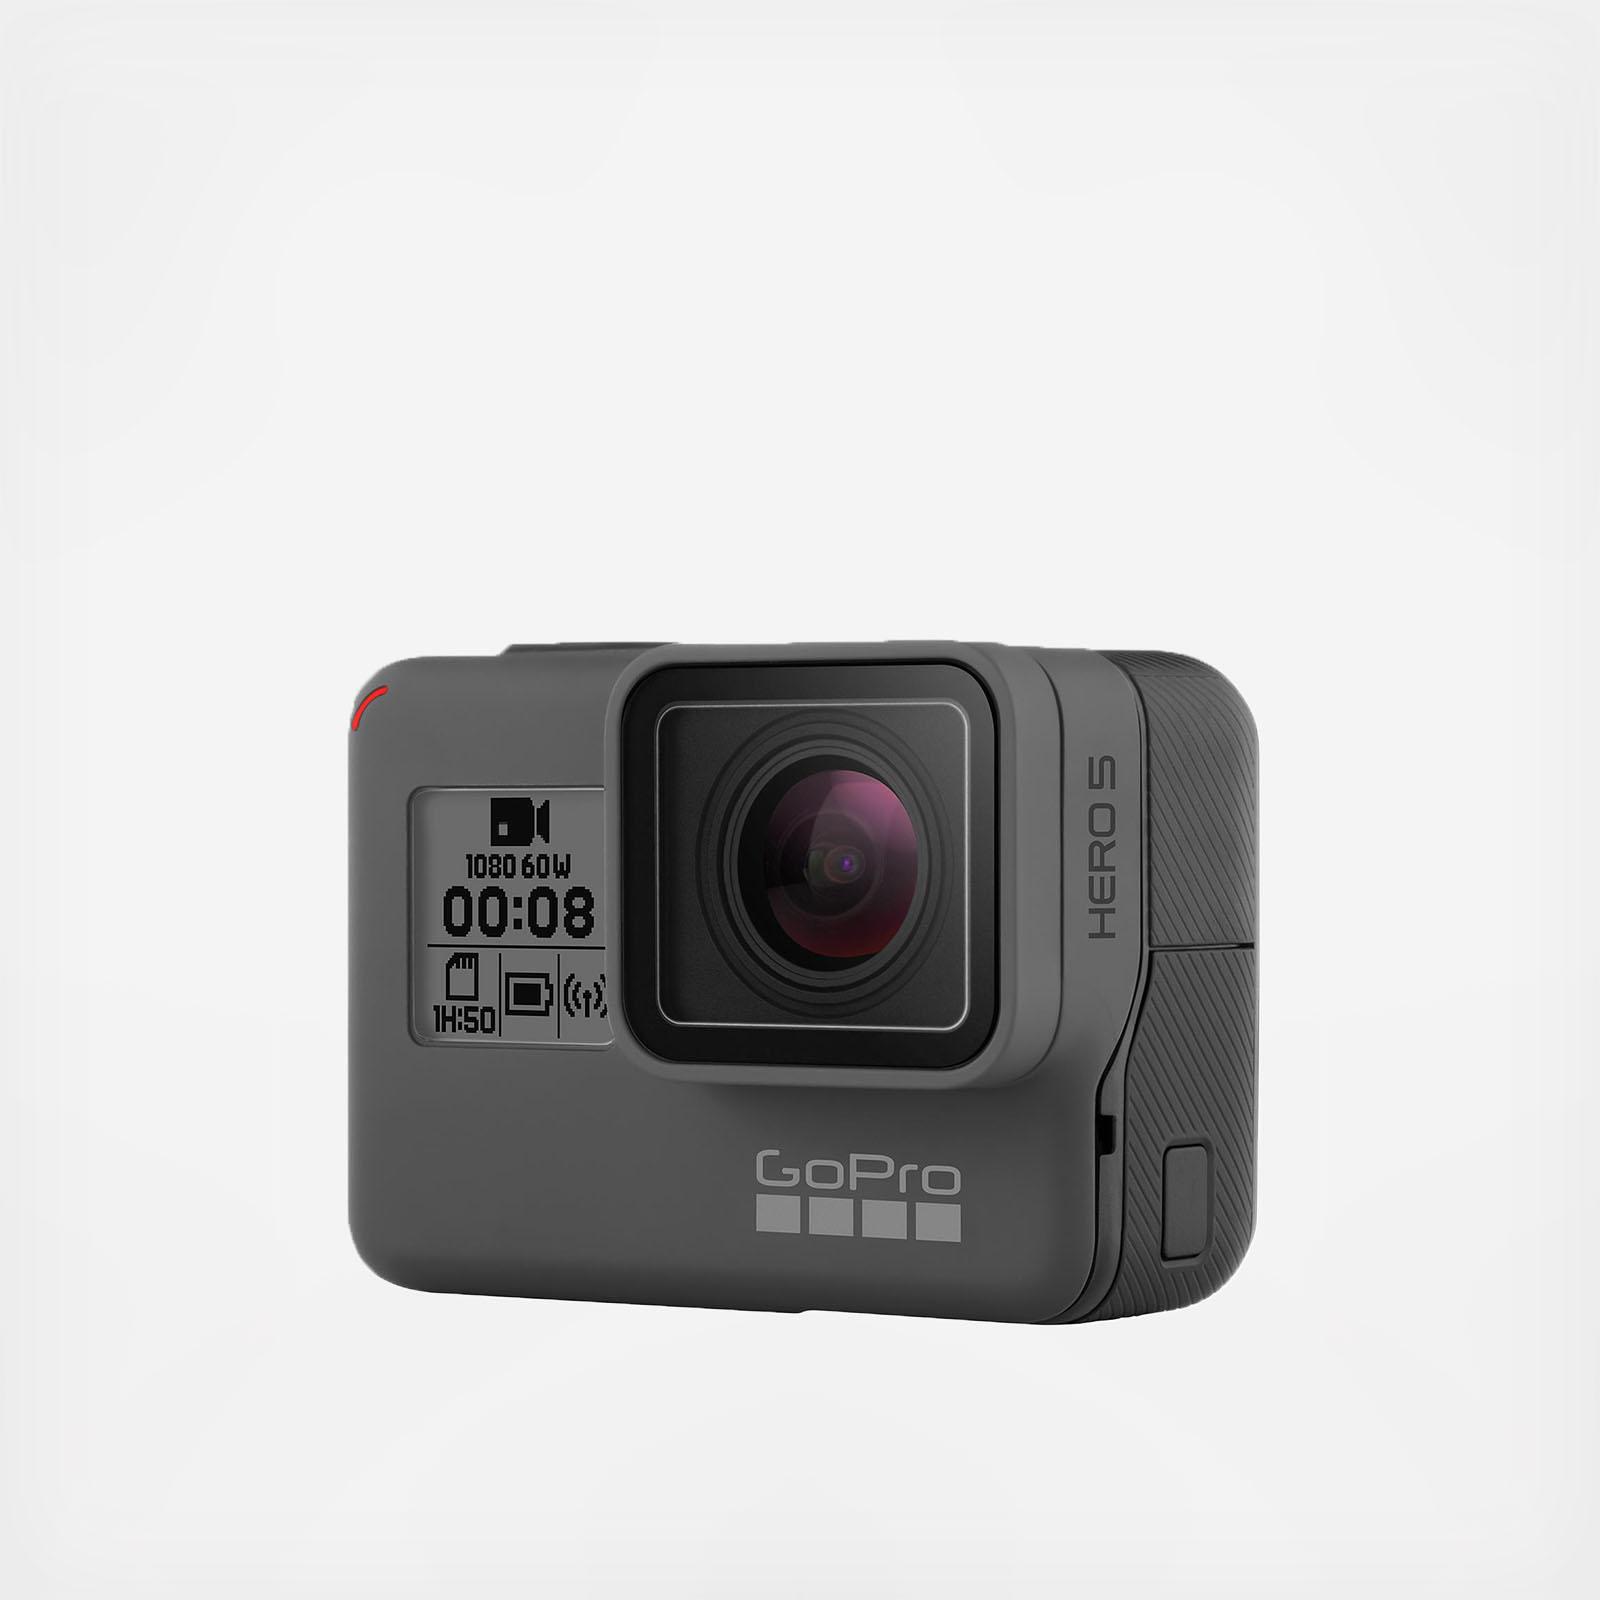 hero 5 black camera